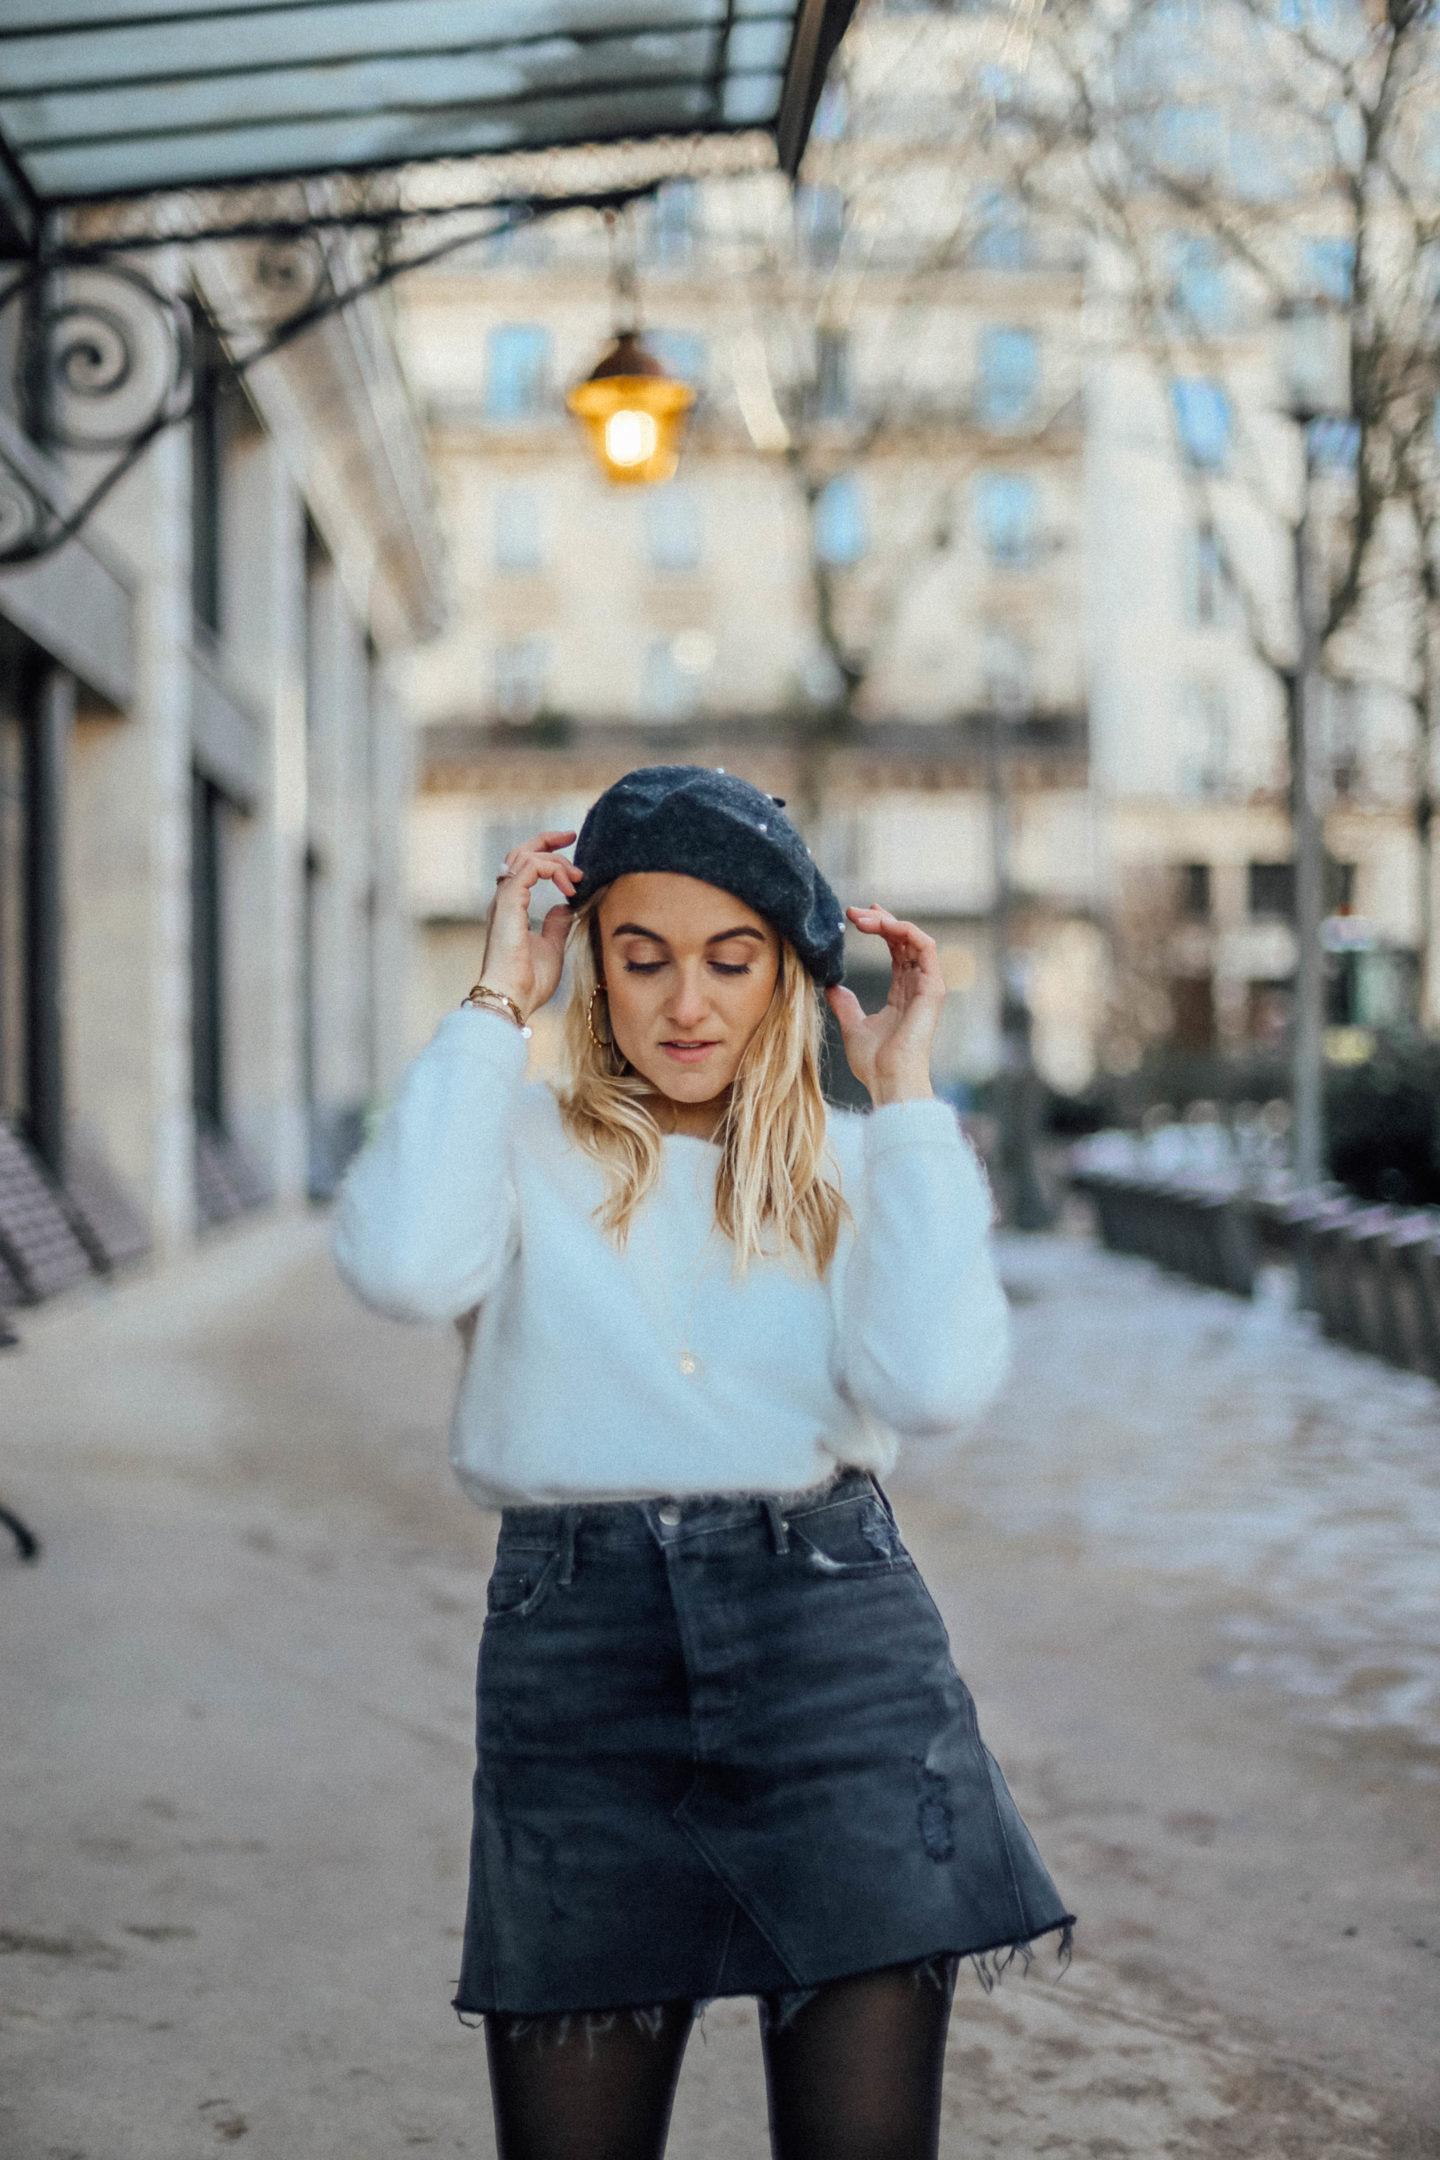 Cheveux blonds - Blondie Baby blog mode et voyages